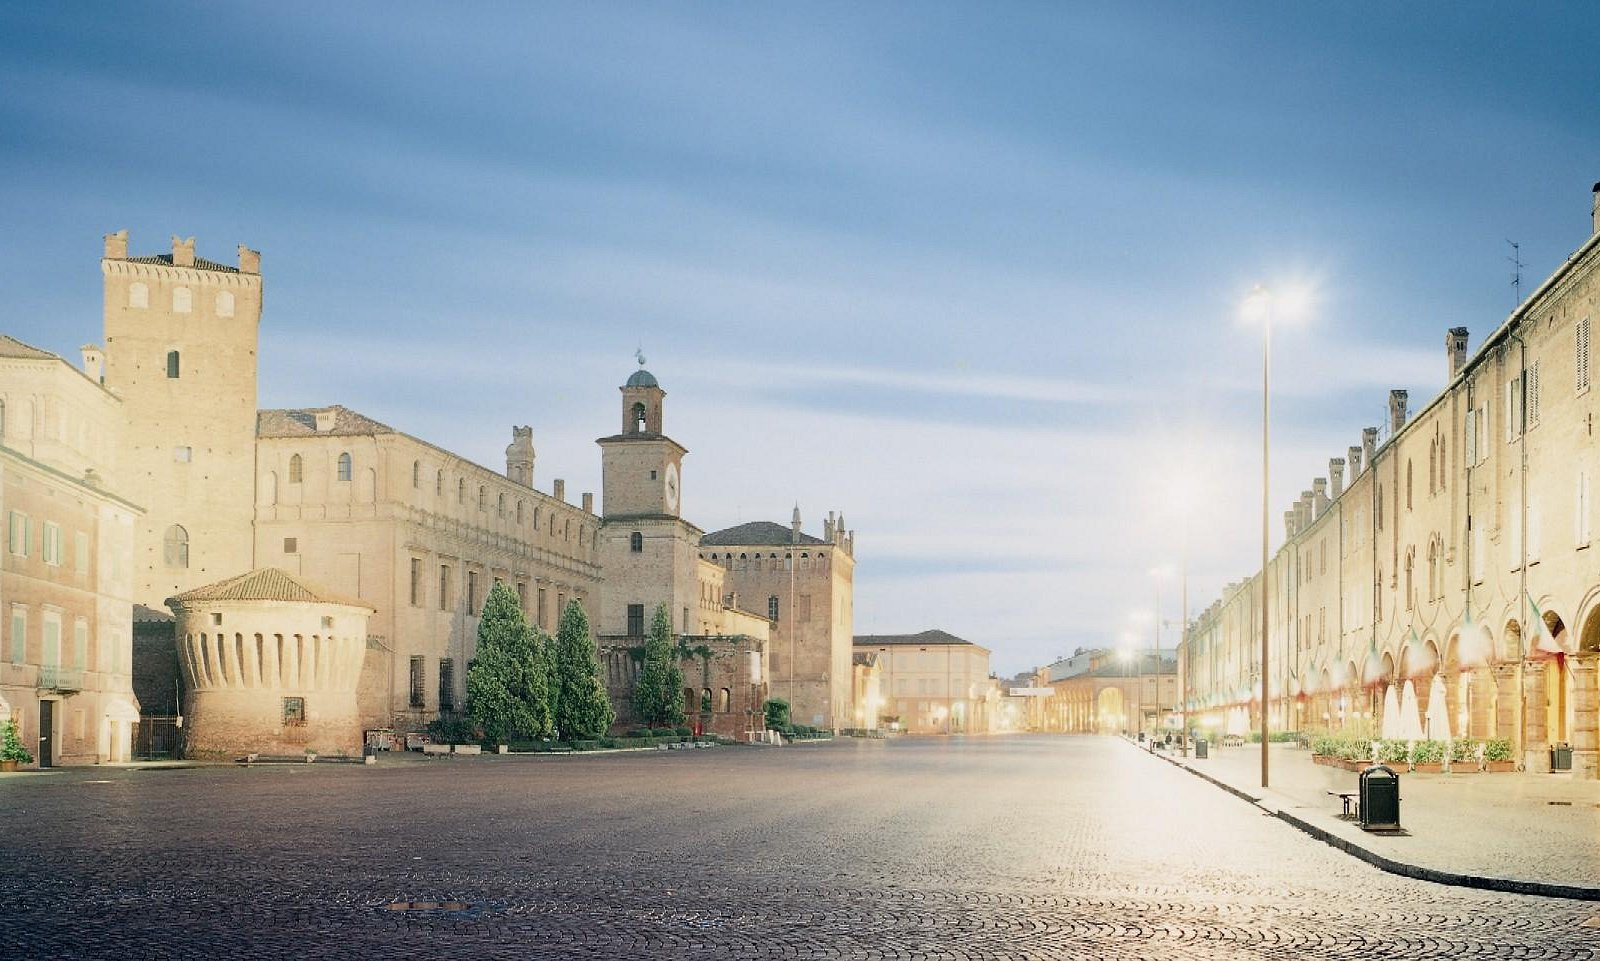 Piazza Martiri - foto di Olivo Barbieri